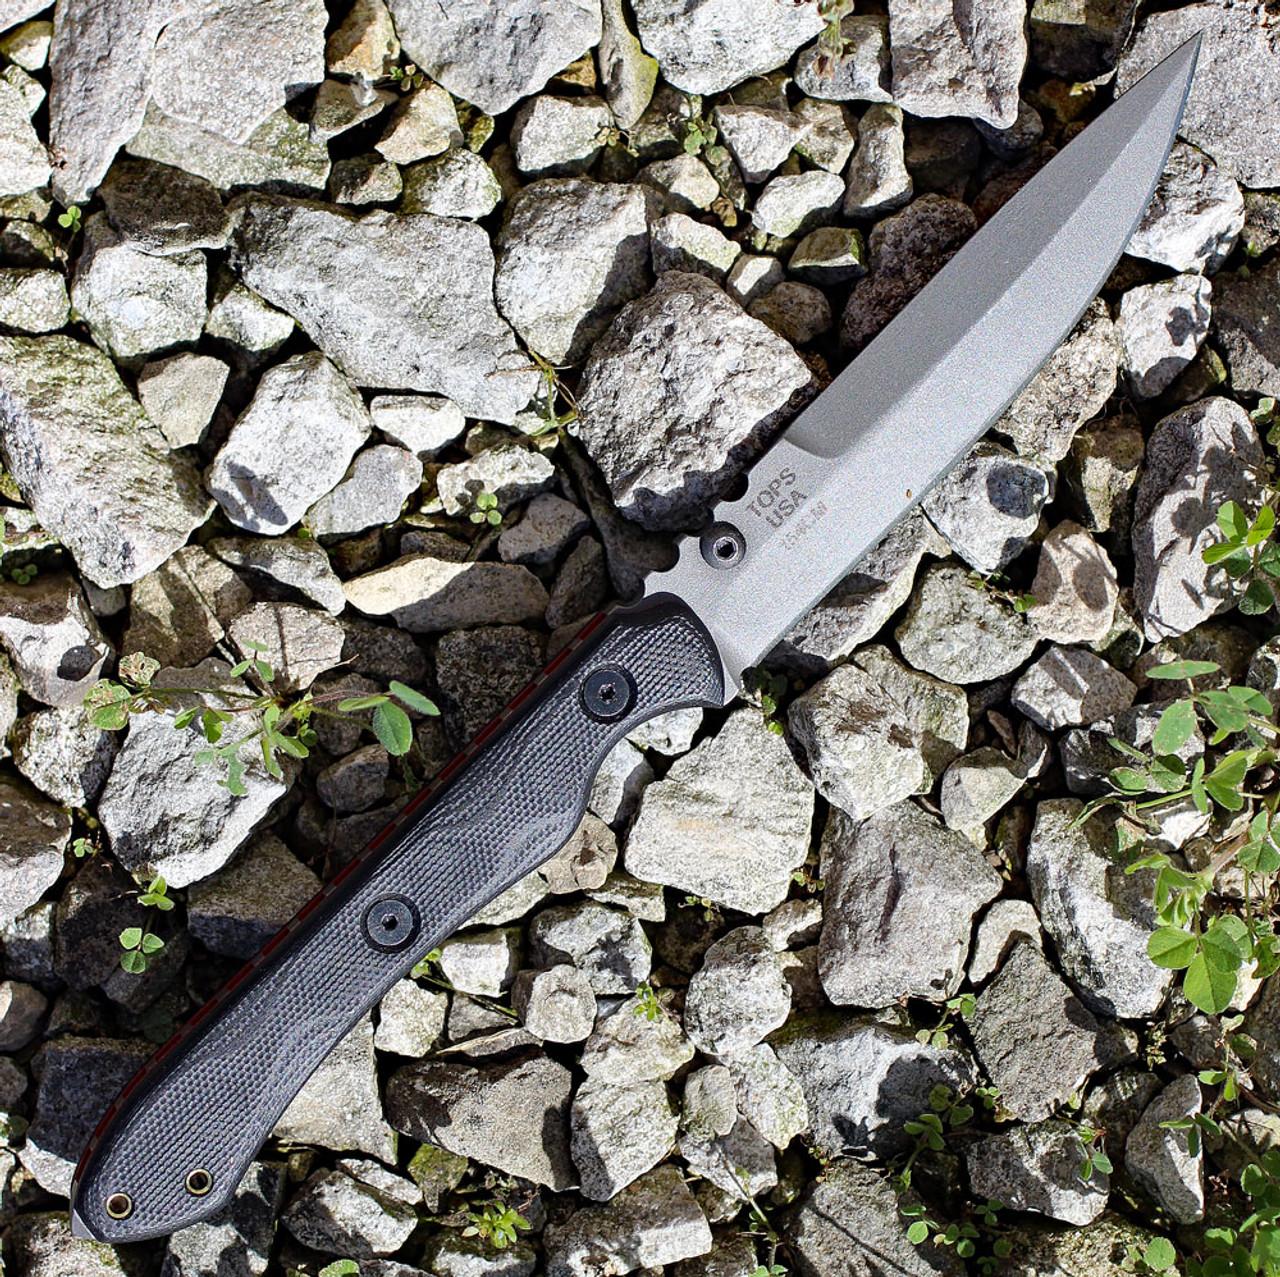 "TOPS RDSK-01 Rapid Strike, 4.13"" 154cm Tumble Plain Blade, Black G-10 Handle"